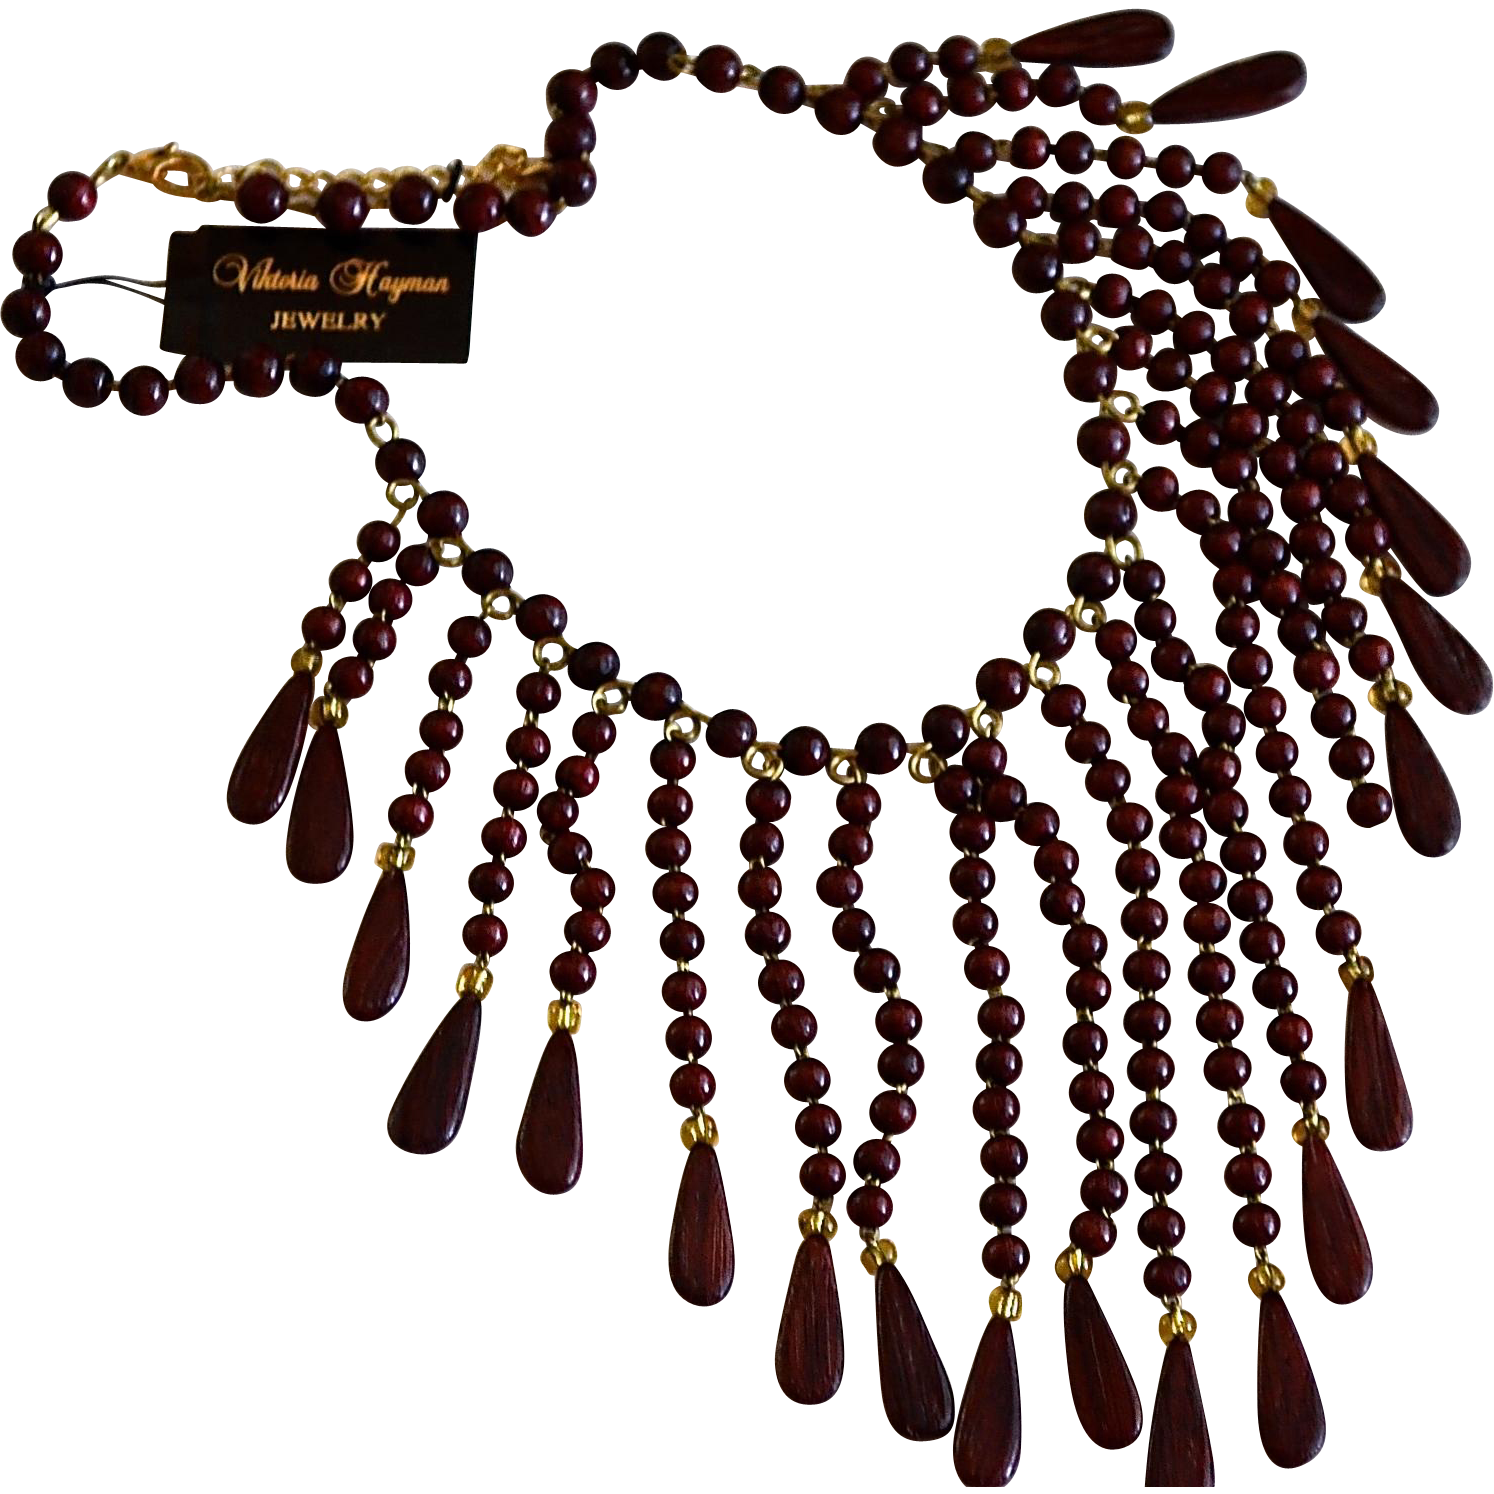 Russian Designer Viktoria Hayman Ebony Wood Bib Necklace / Earrings